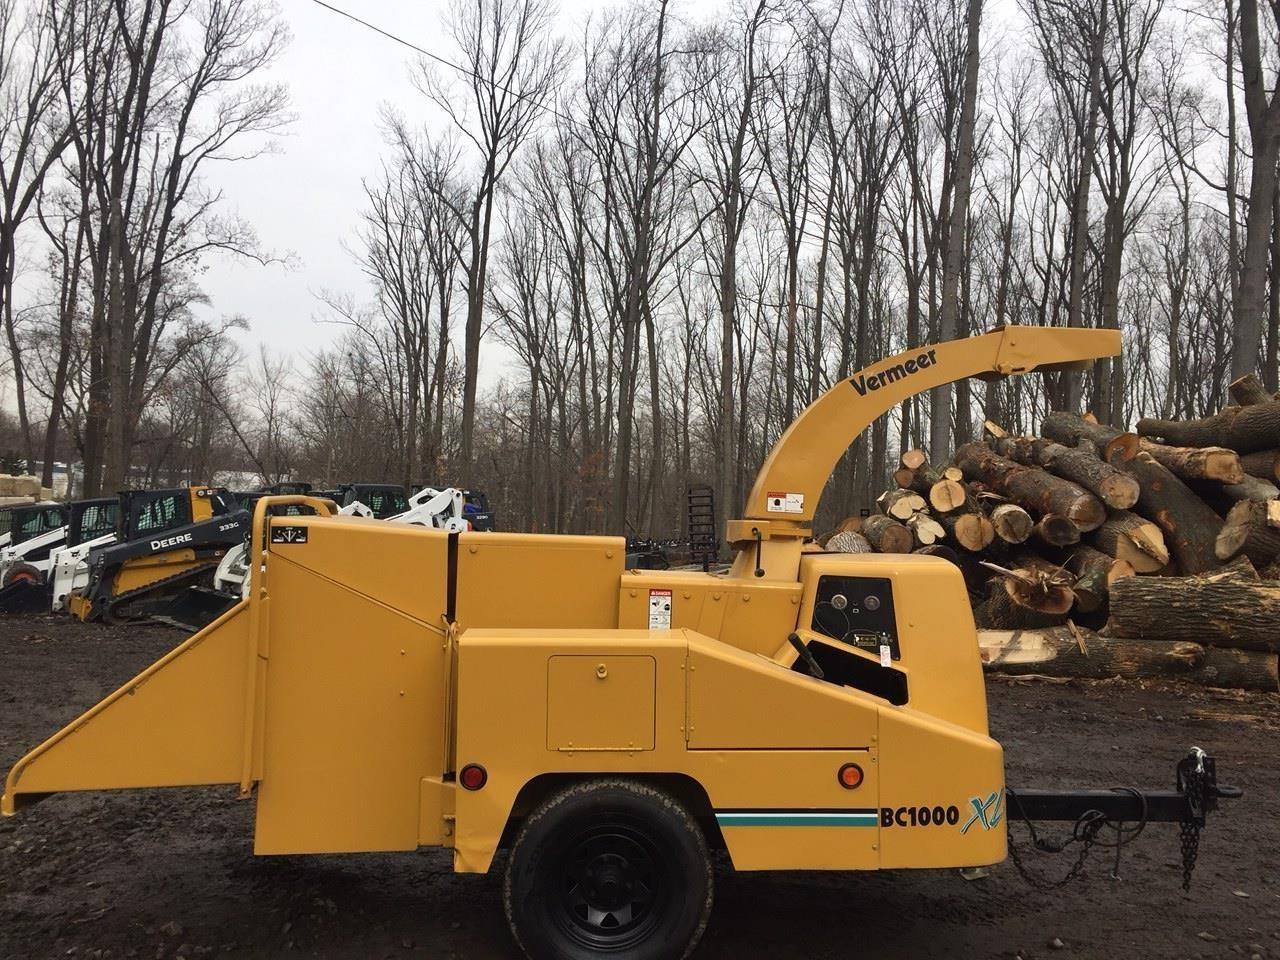 VERMEER BC1000XL For Sale in Wilmington, Delaware